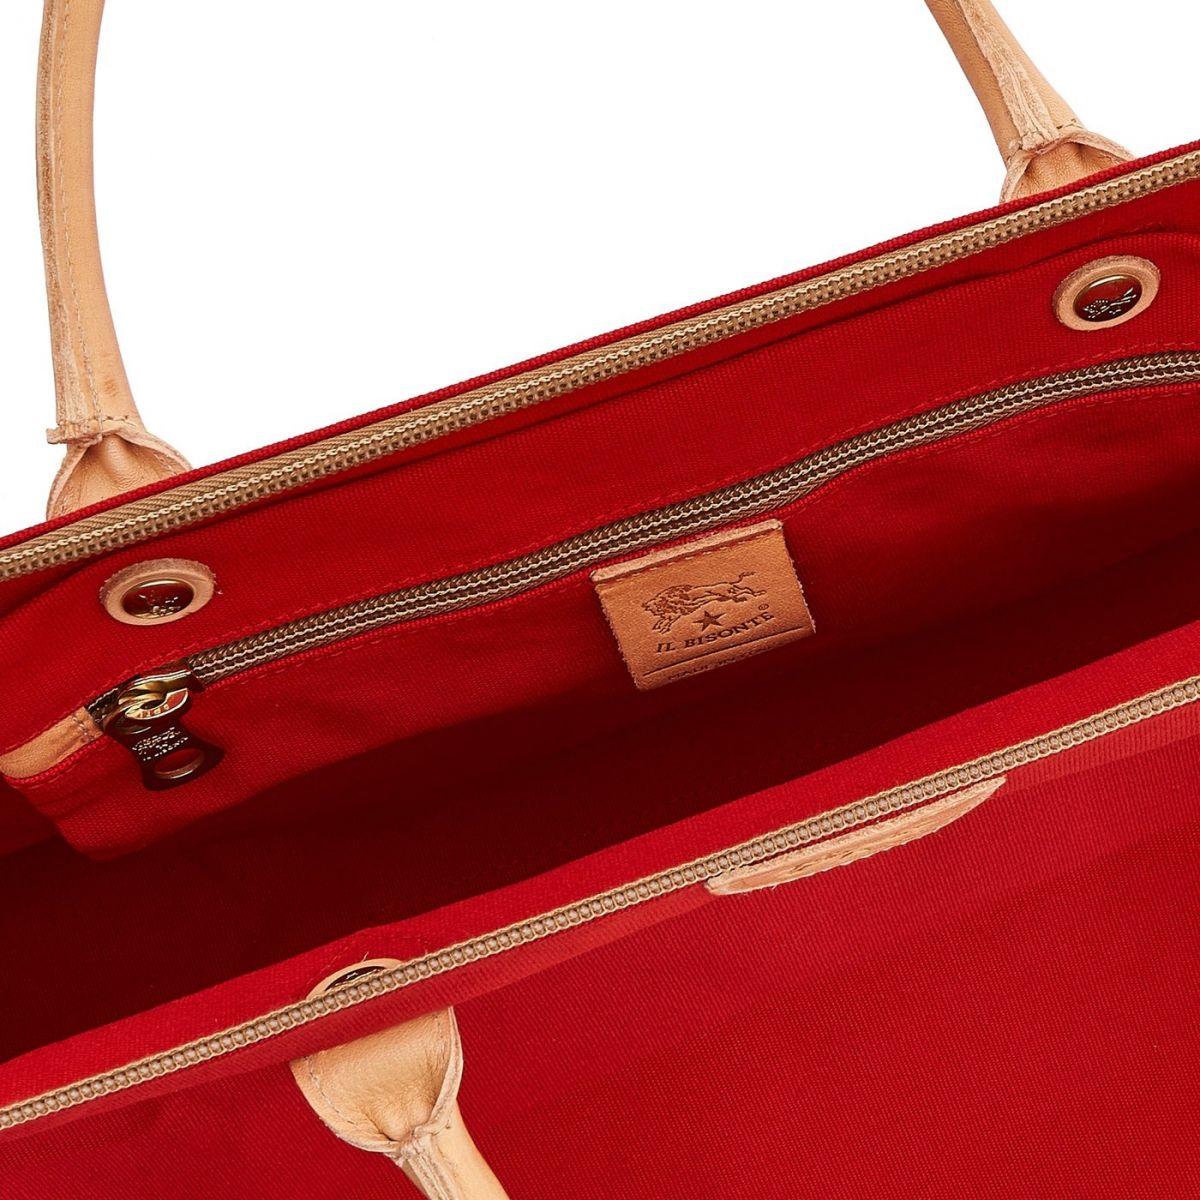 Vagabonda  - Travel Bag  in Cotton Canvas BDU028 color Red/Natural | Details